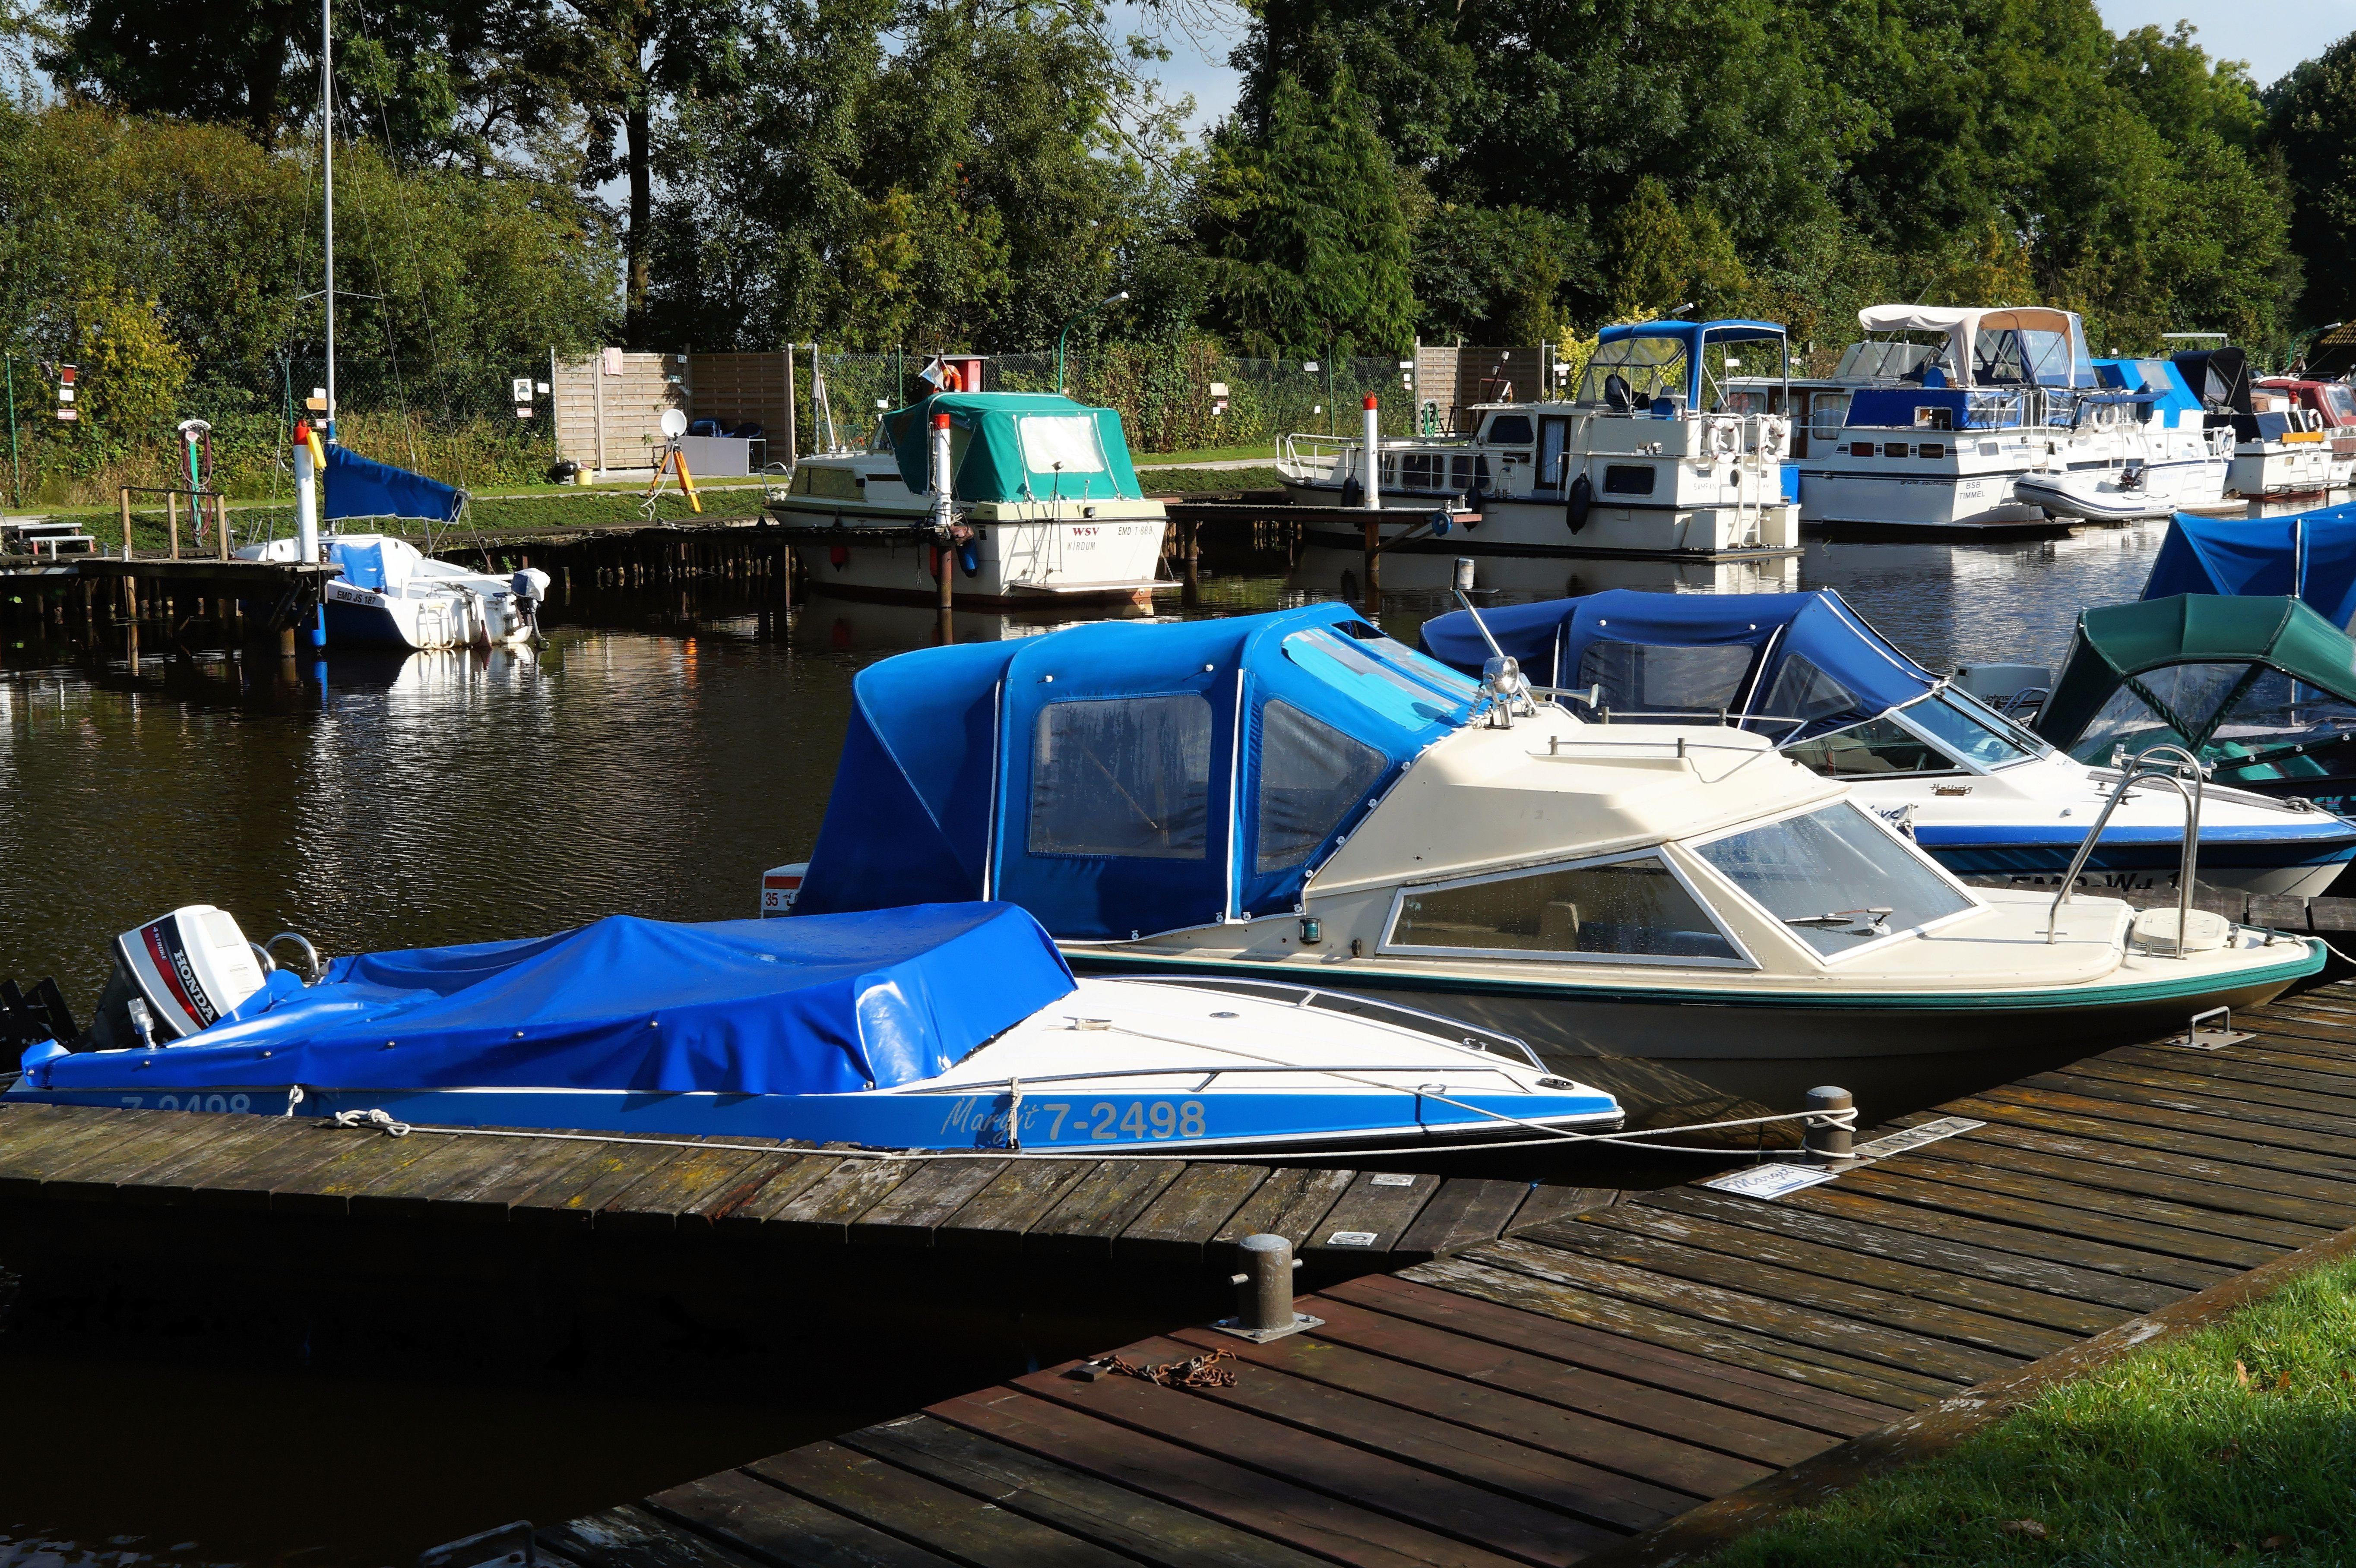 dock boat canopy vehicle marina port waterway motorboat boating watercraft ecosystem powerboat skiff watercraft rowing & Free Images : dock boat canopy vehicle marina port waterway ...